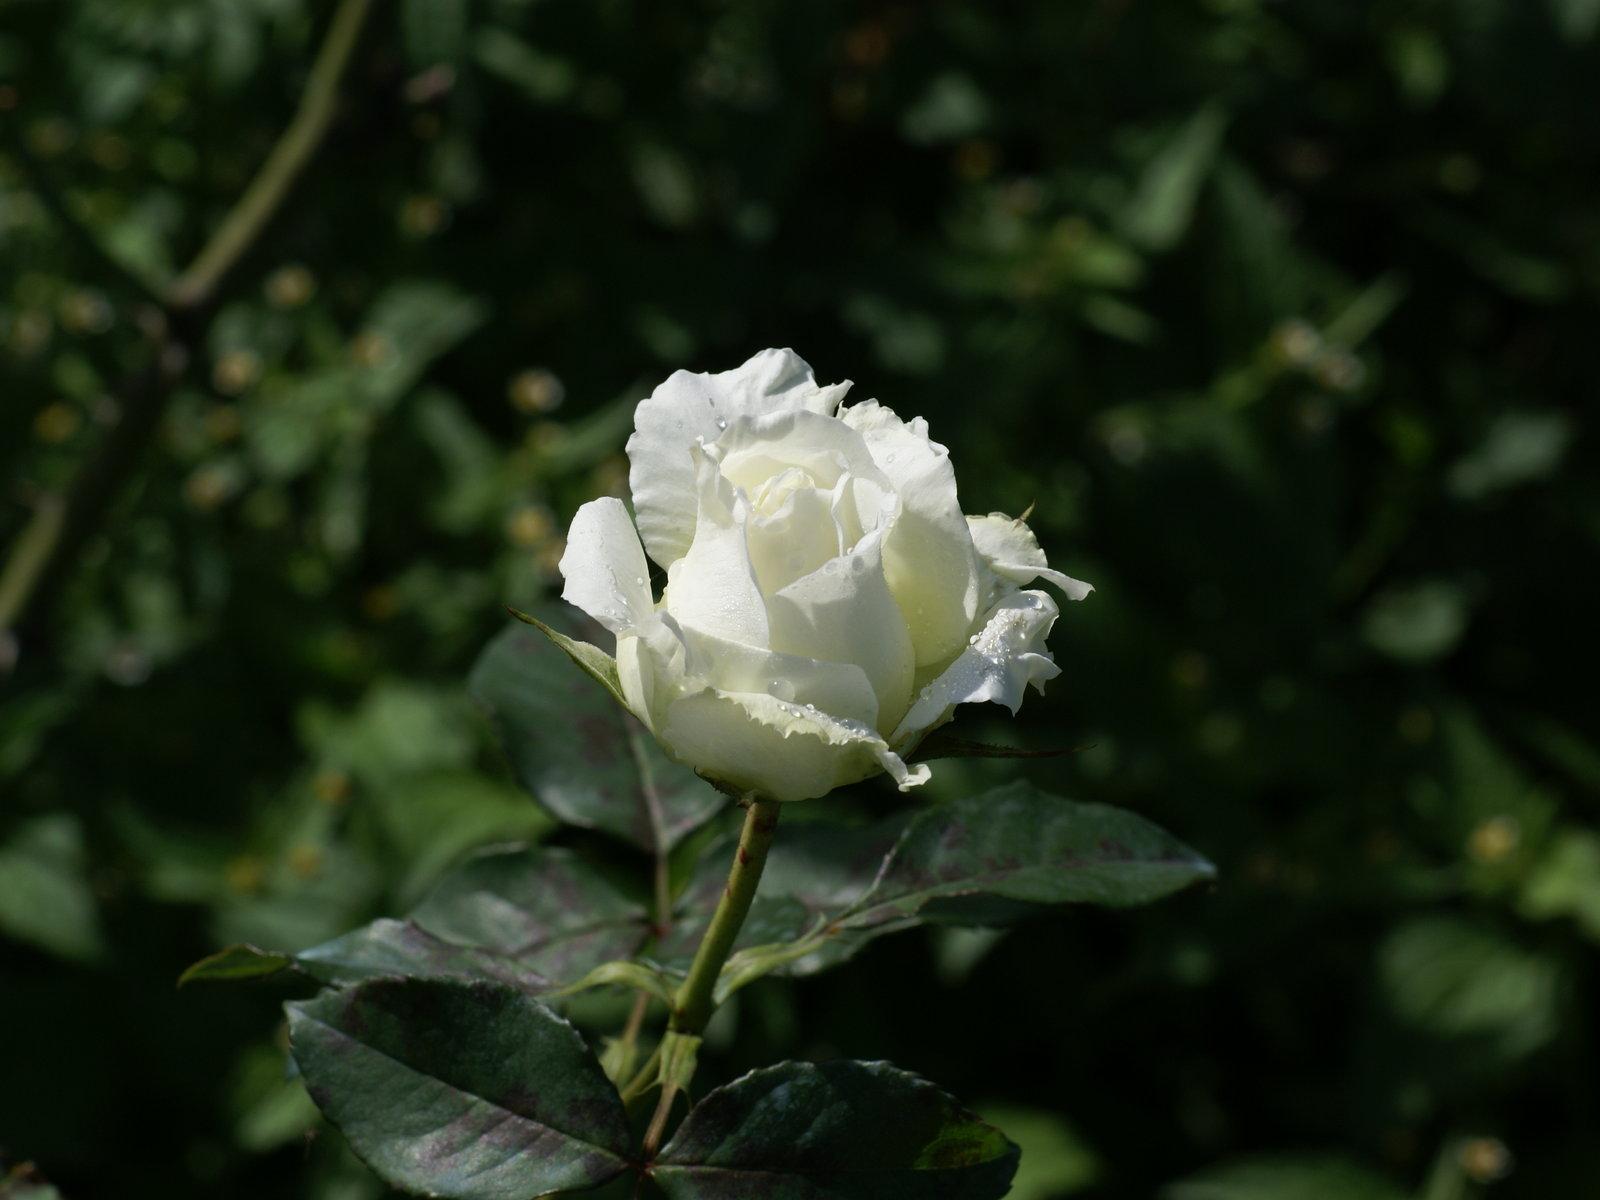 Roses wallpapers: Most beautiful roses free computer ...  Beautiful White Rose Wallpaper